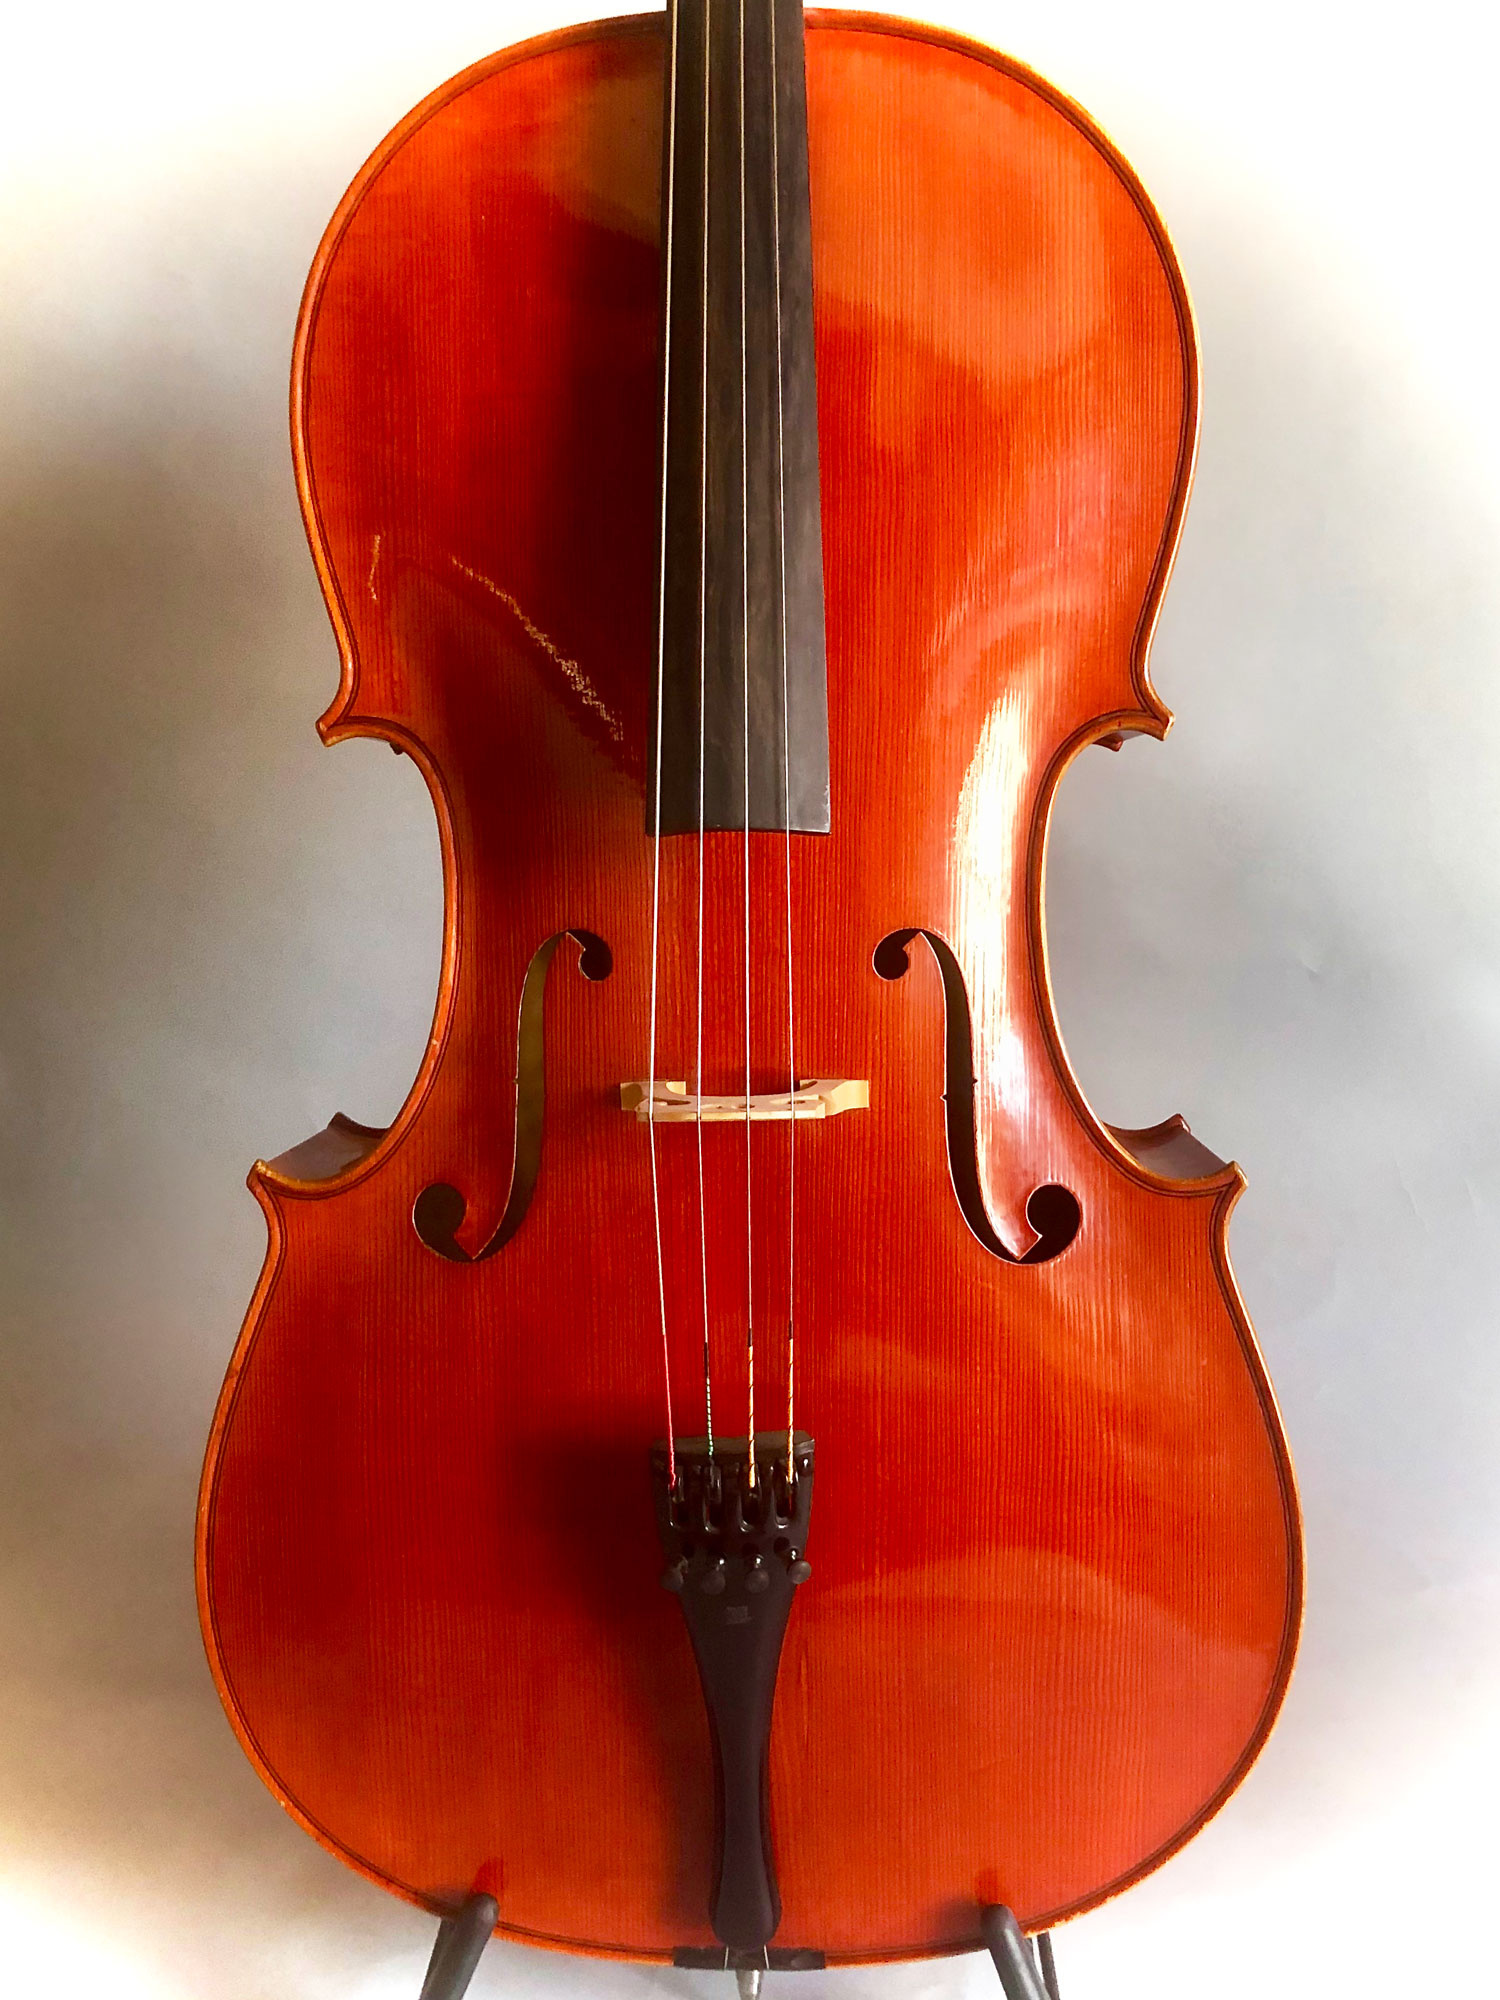 Italian Aldo Zani 4/4 cello, Cesena, Italy 1965